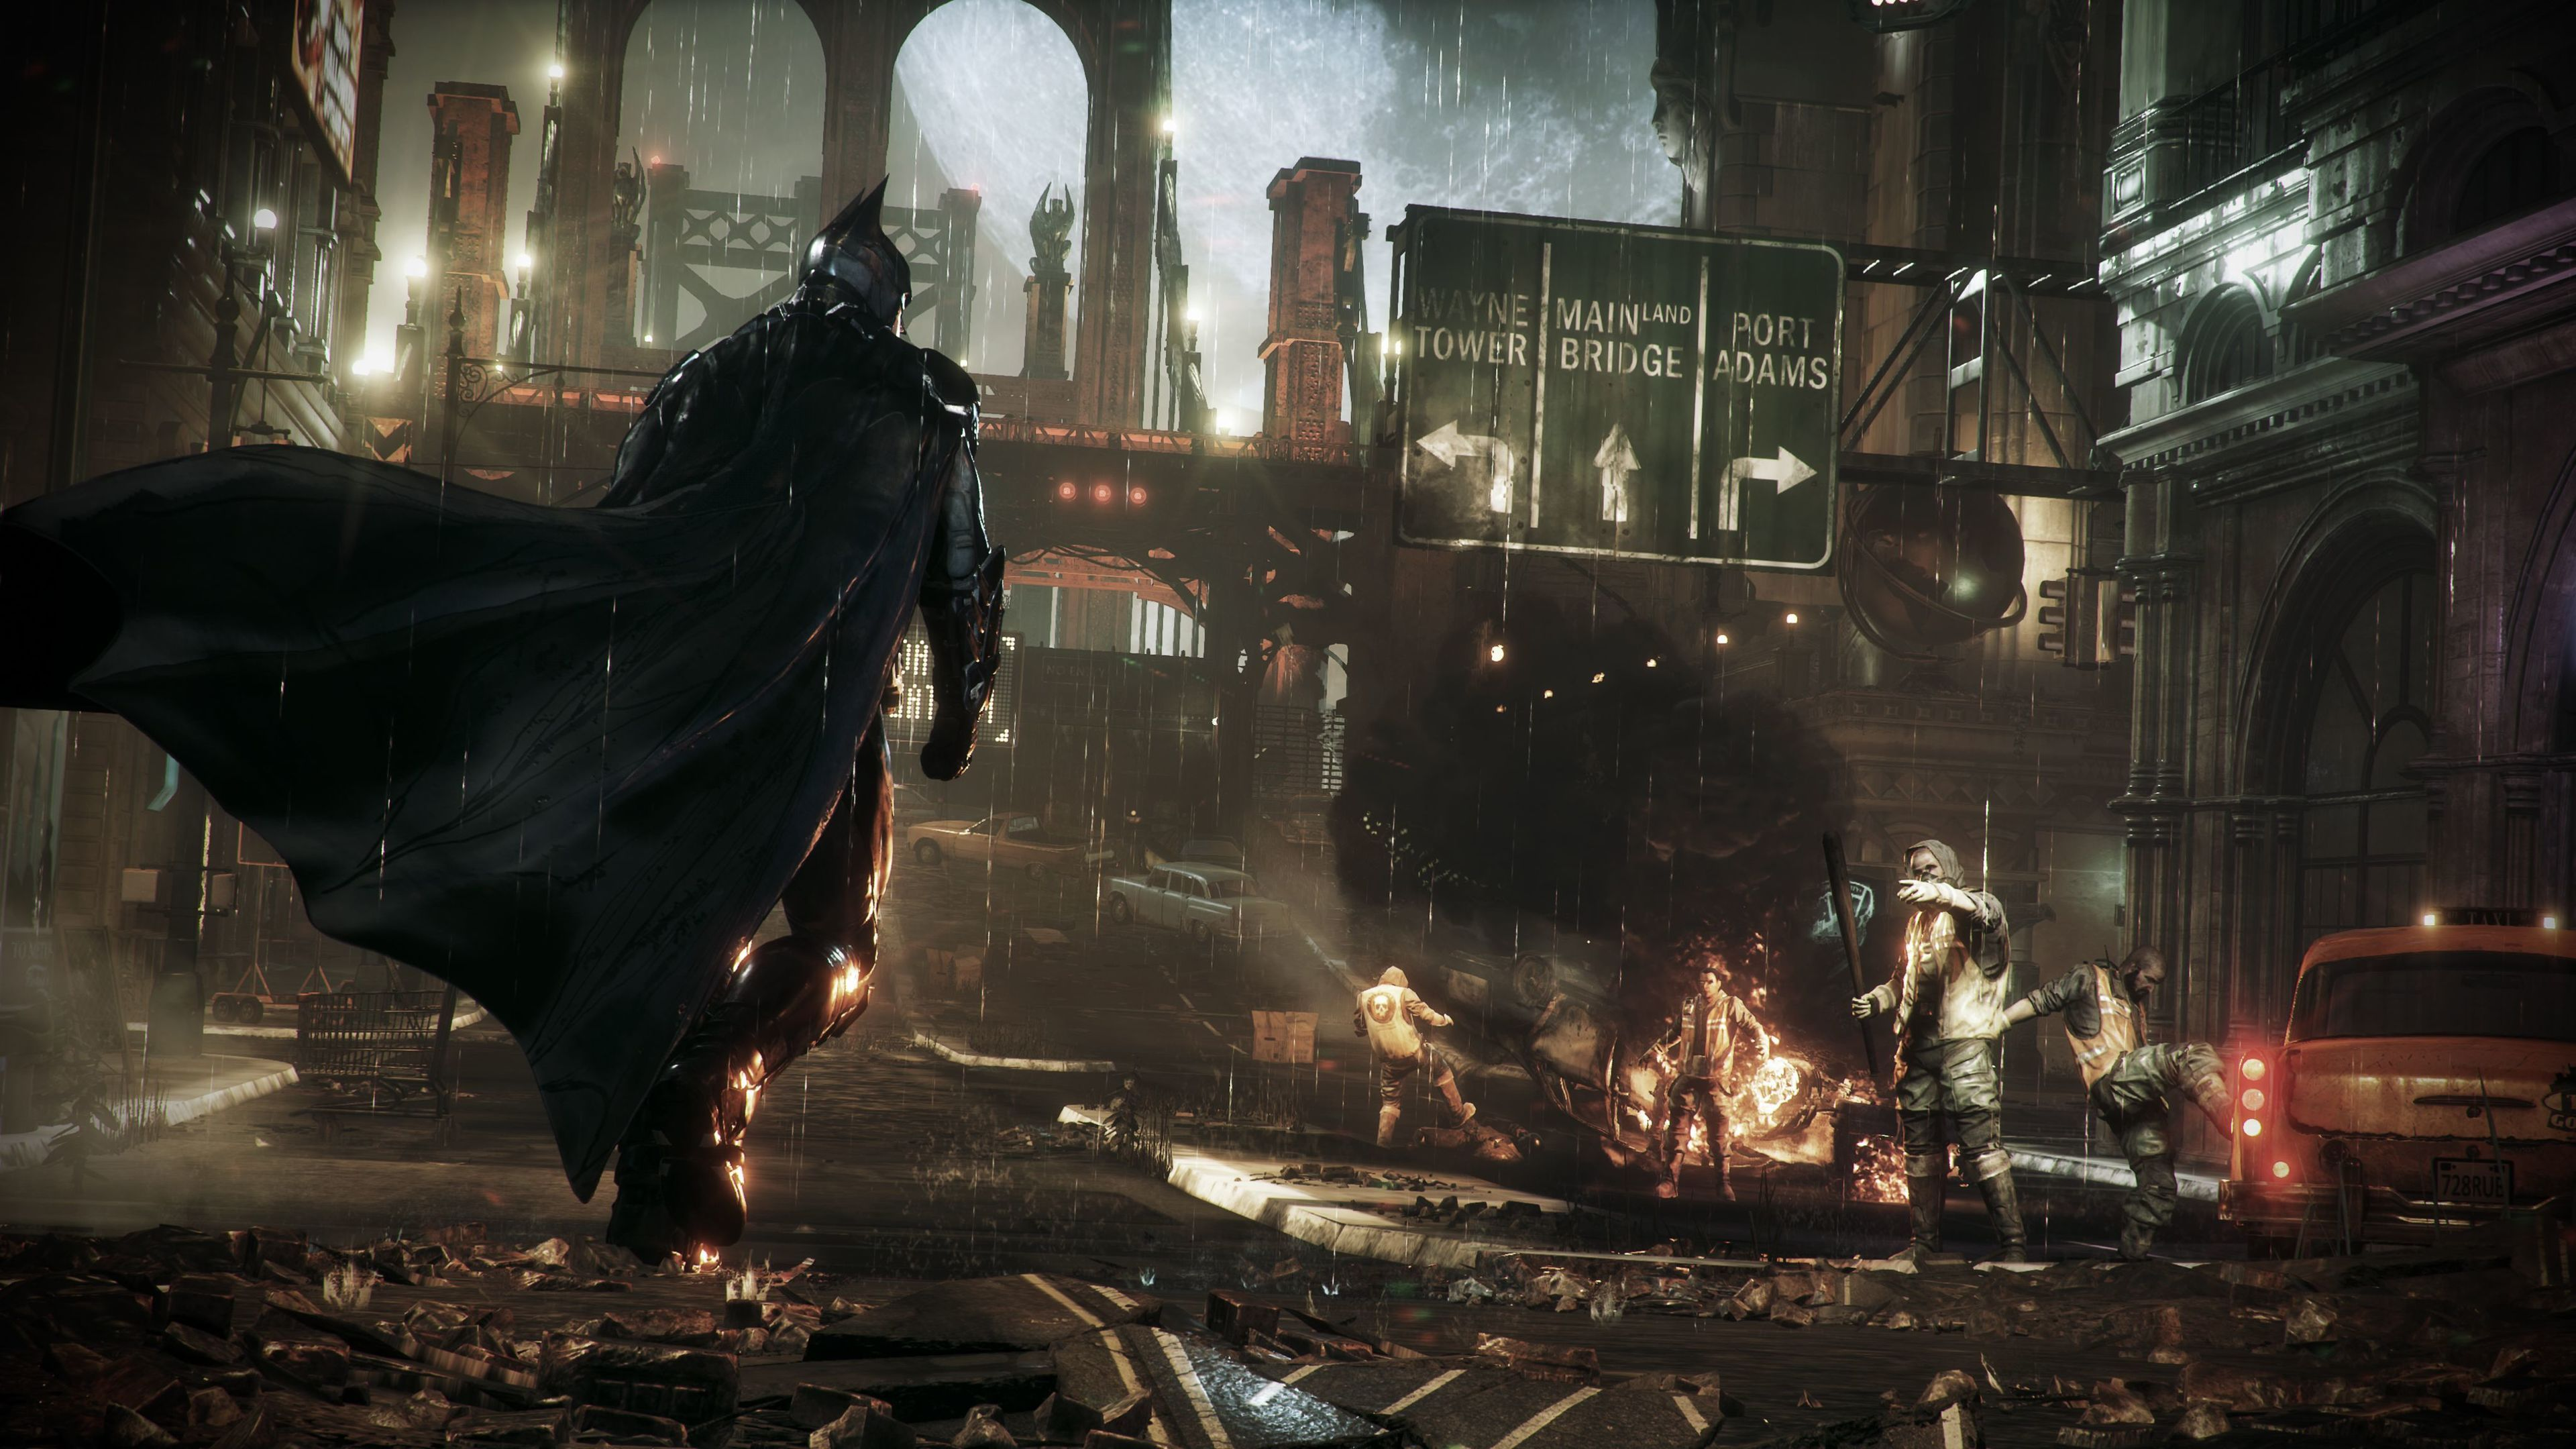 Batman Arkham Origins 4k Hd Wallpapers Games Wallpapers Batman Wallpapers Bat Batman Arkham Knight Wallpaper Batman Arkham Knight Game Batman Arkham Origins